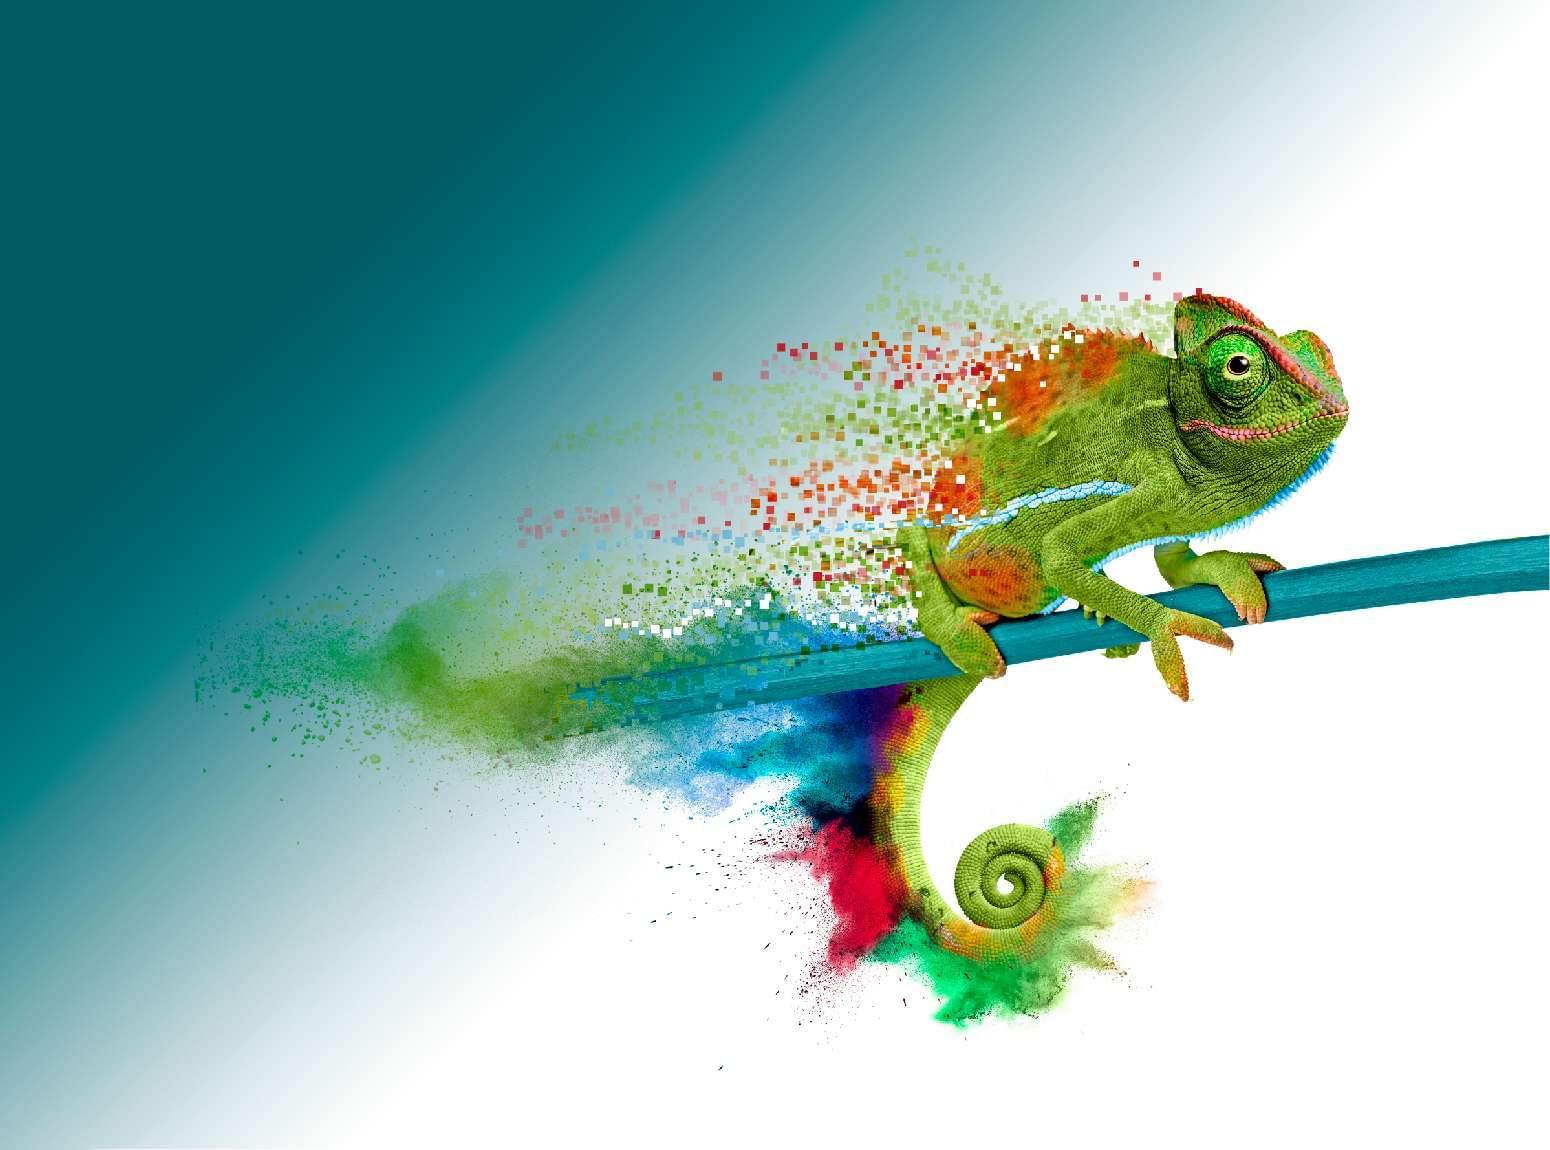 Kameleon-website-header-v2